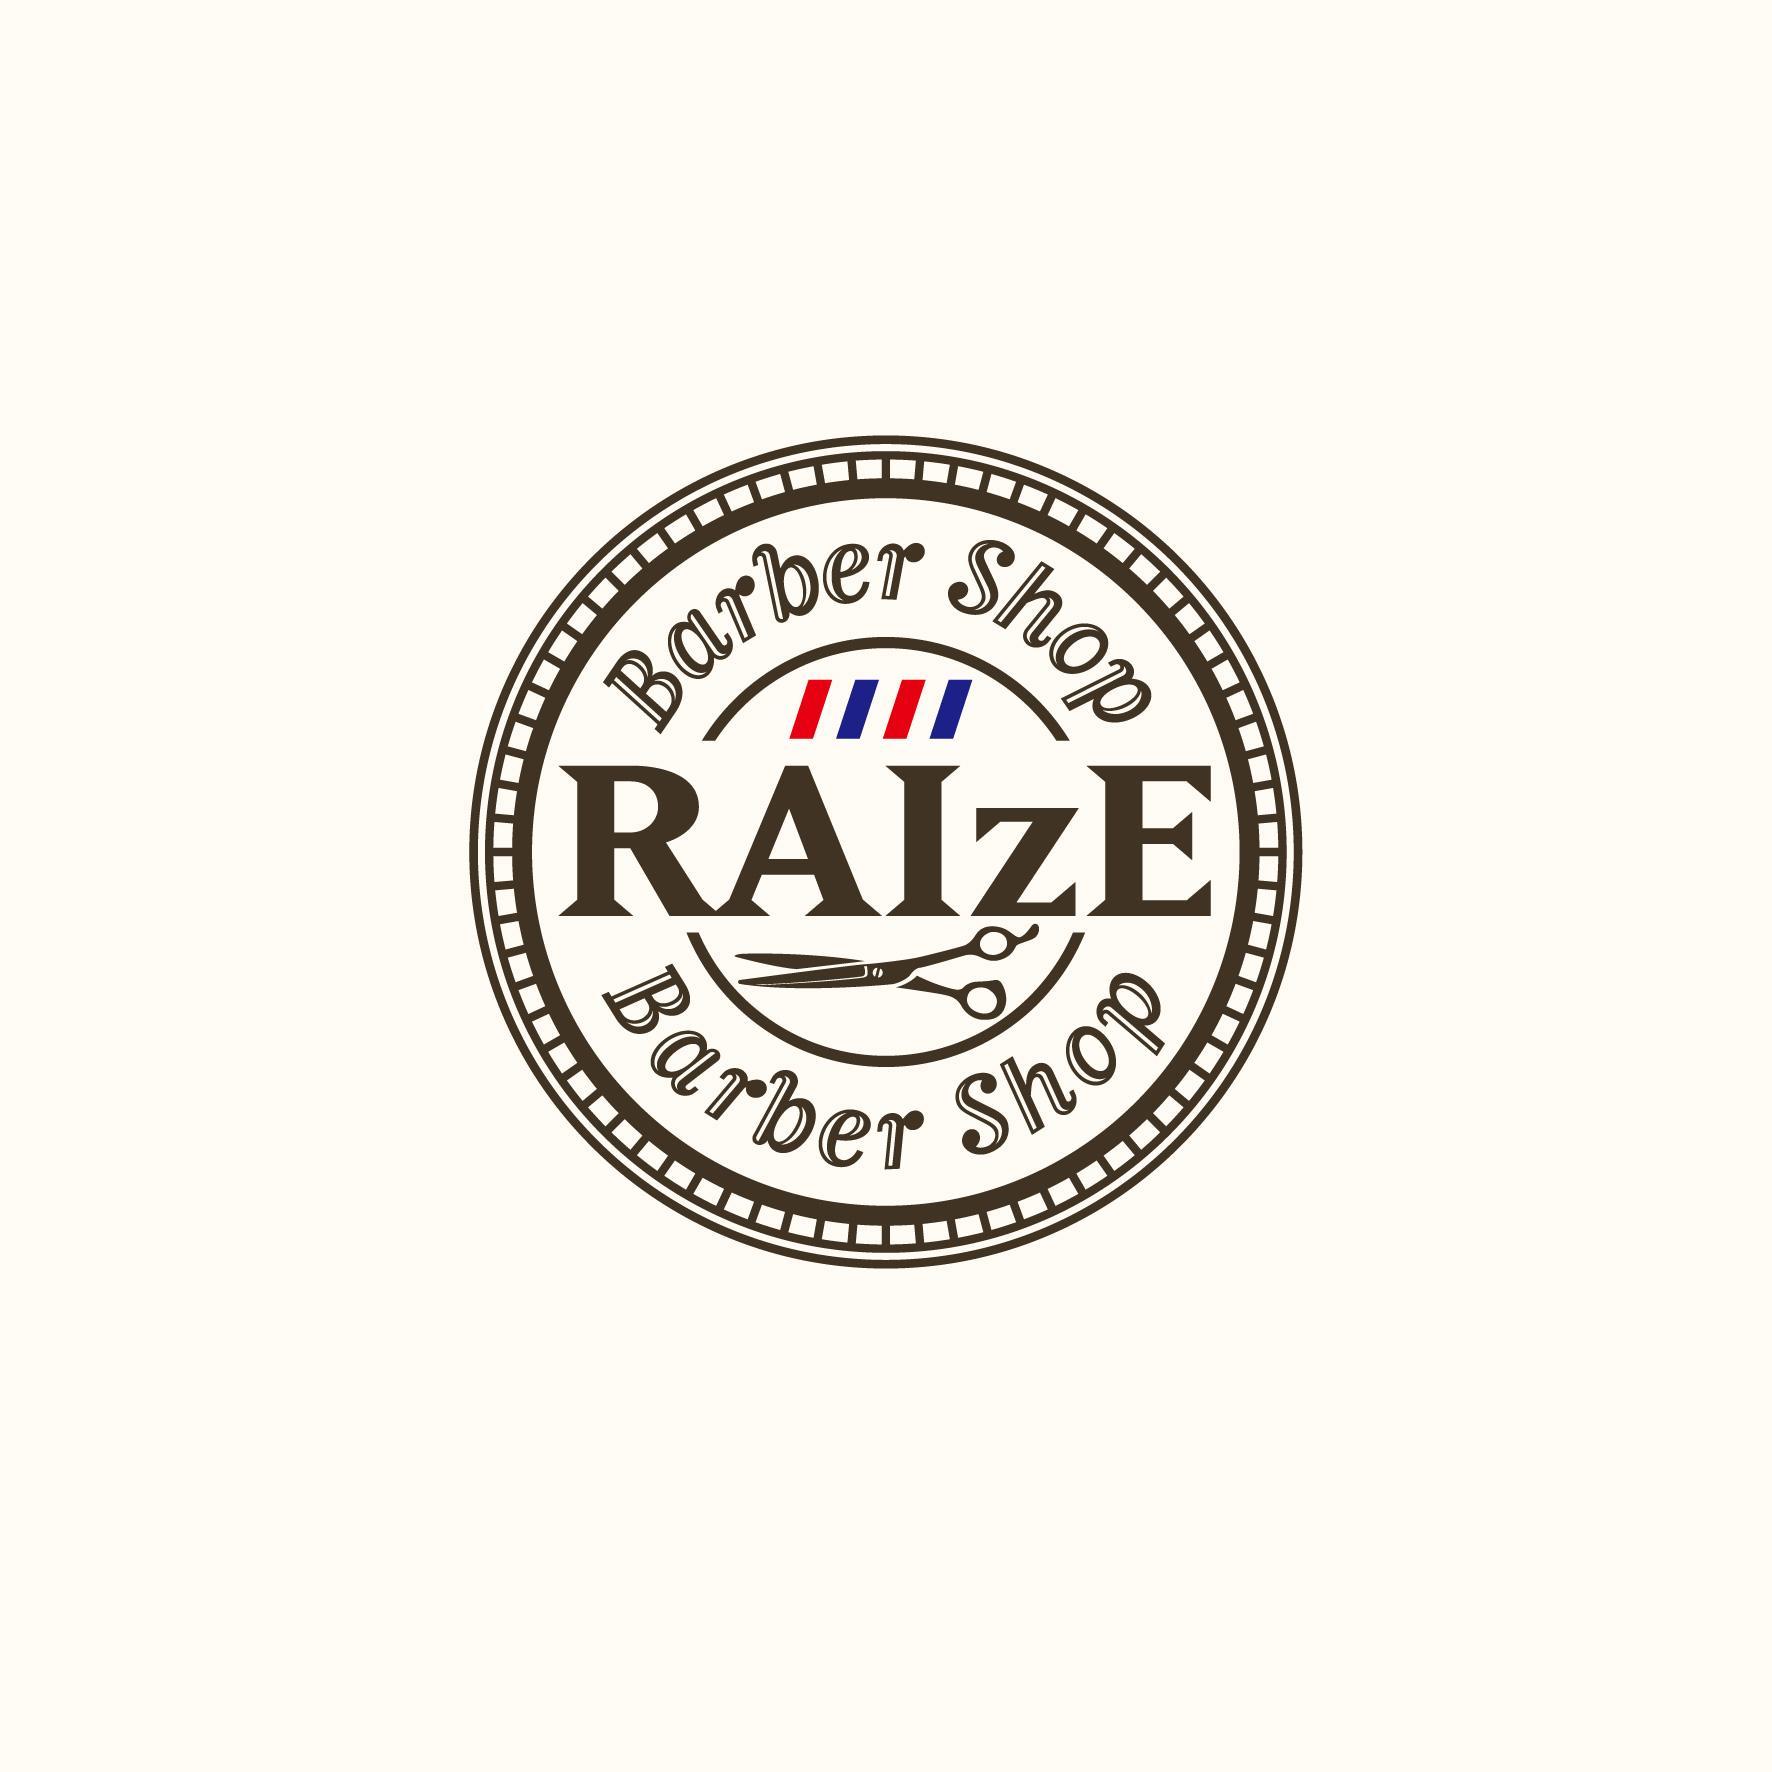 Barber Shop RAIzE☆アシスタント募集!